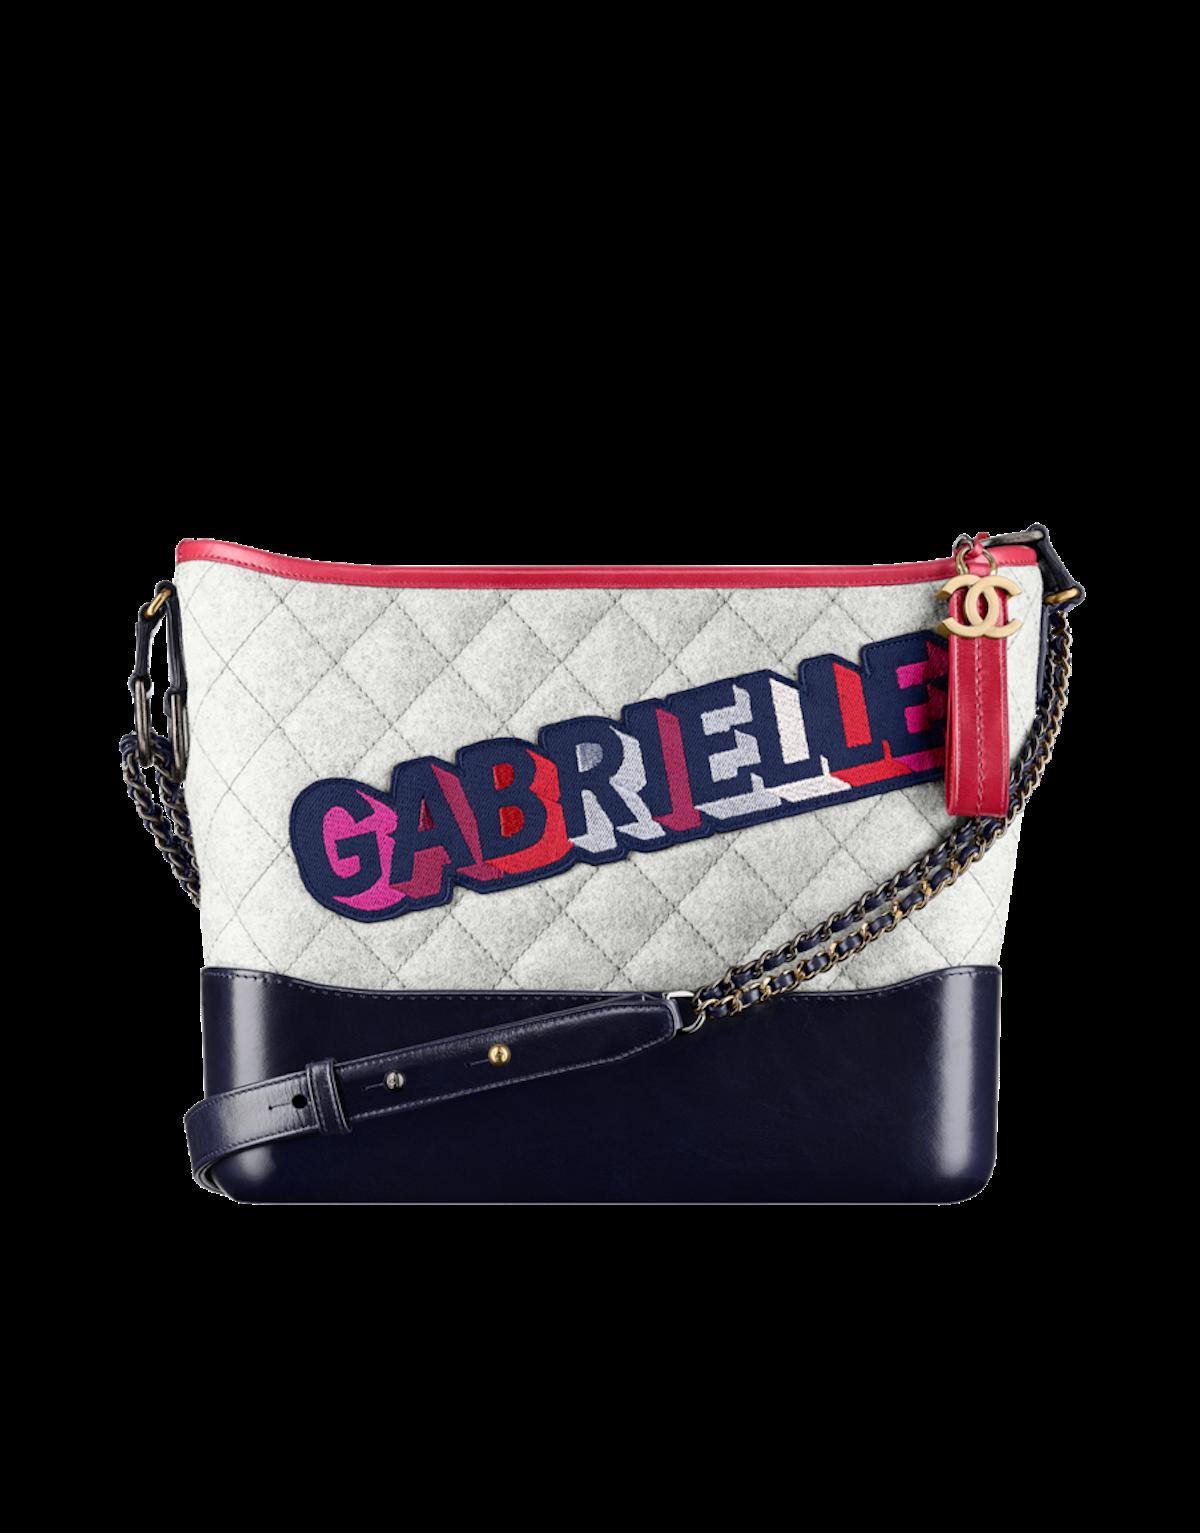 Chanel's Gabrielle Bag For Pre-Fall 2017